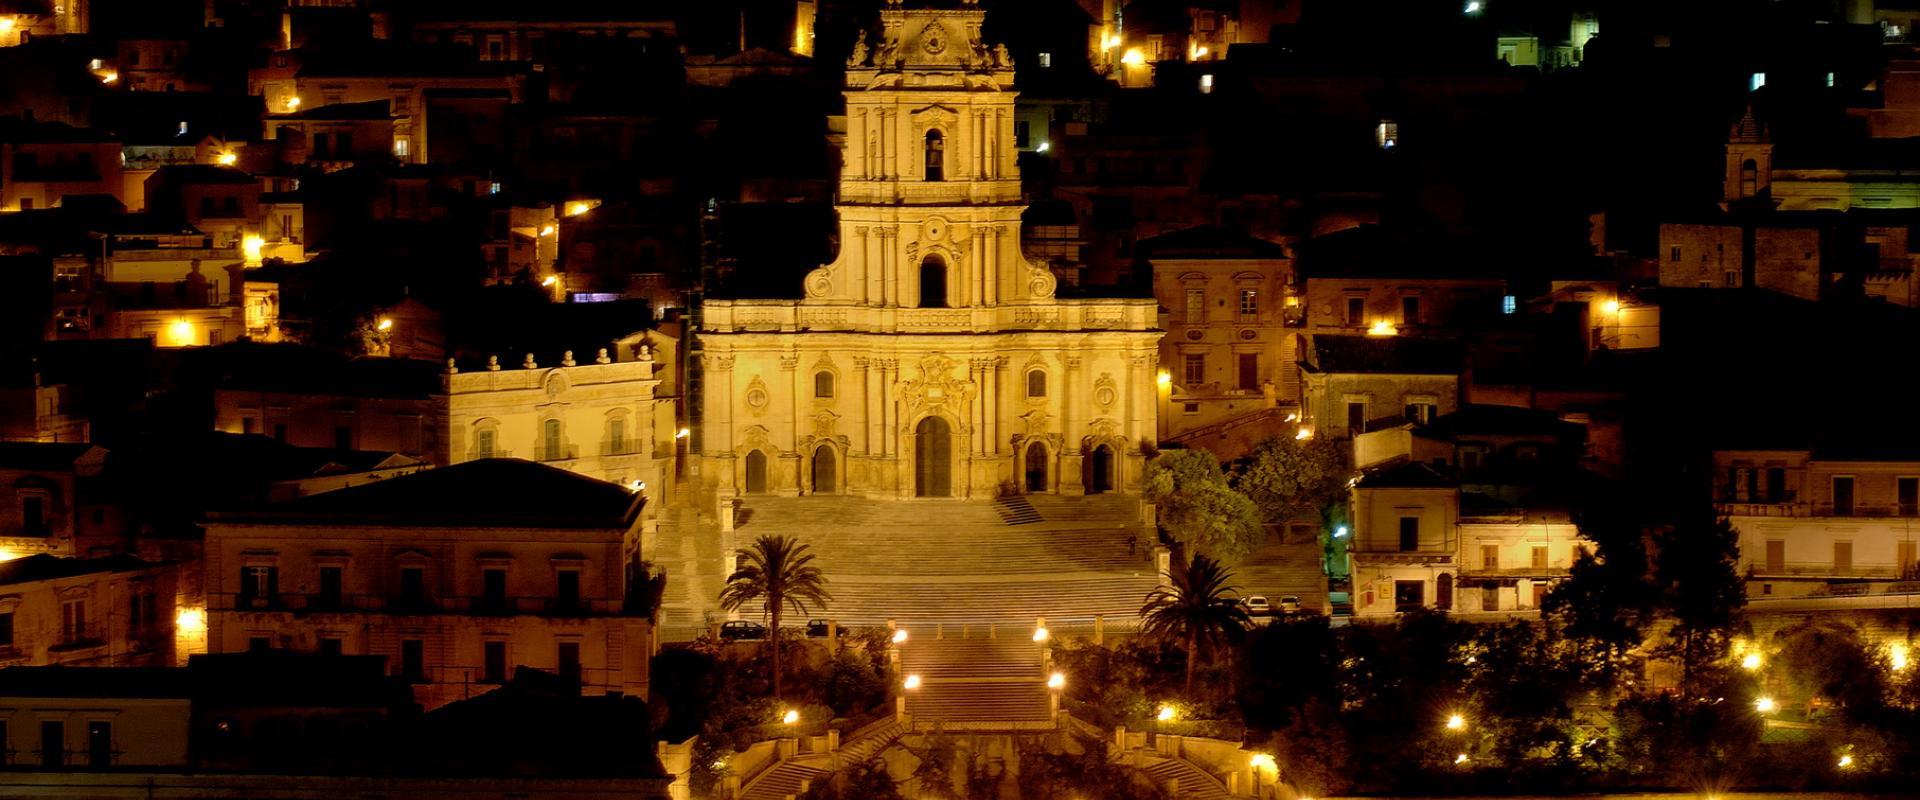 tour Modica by night